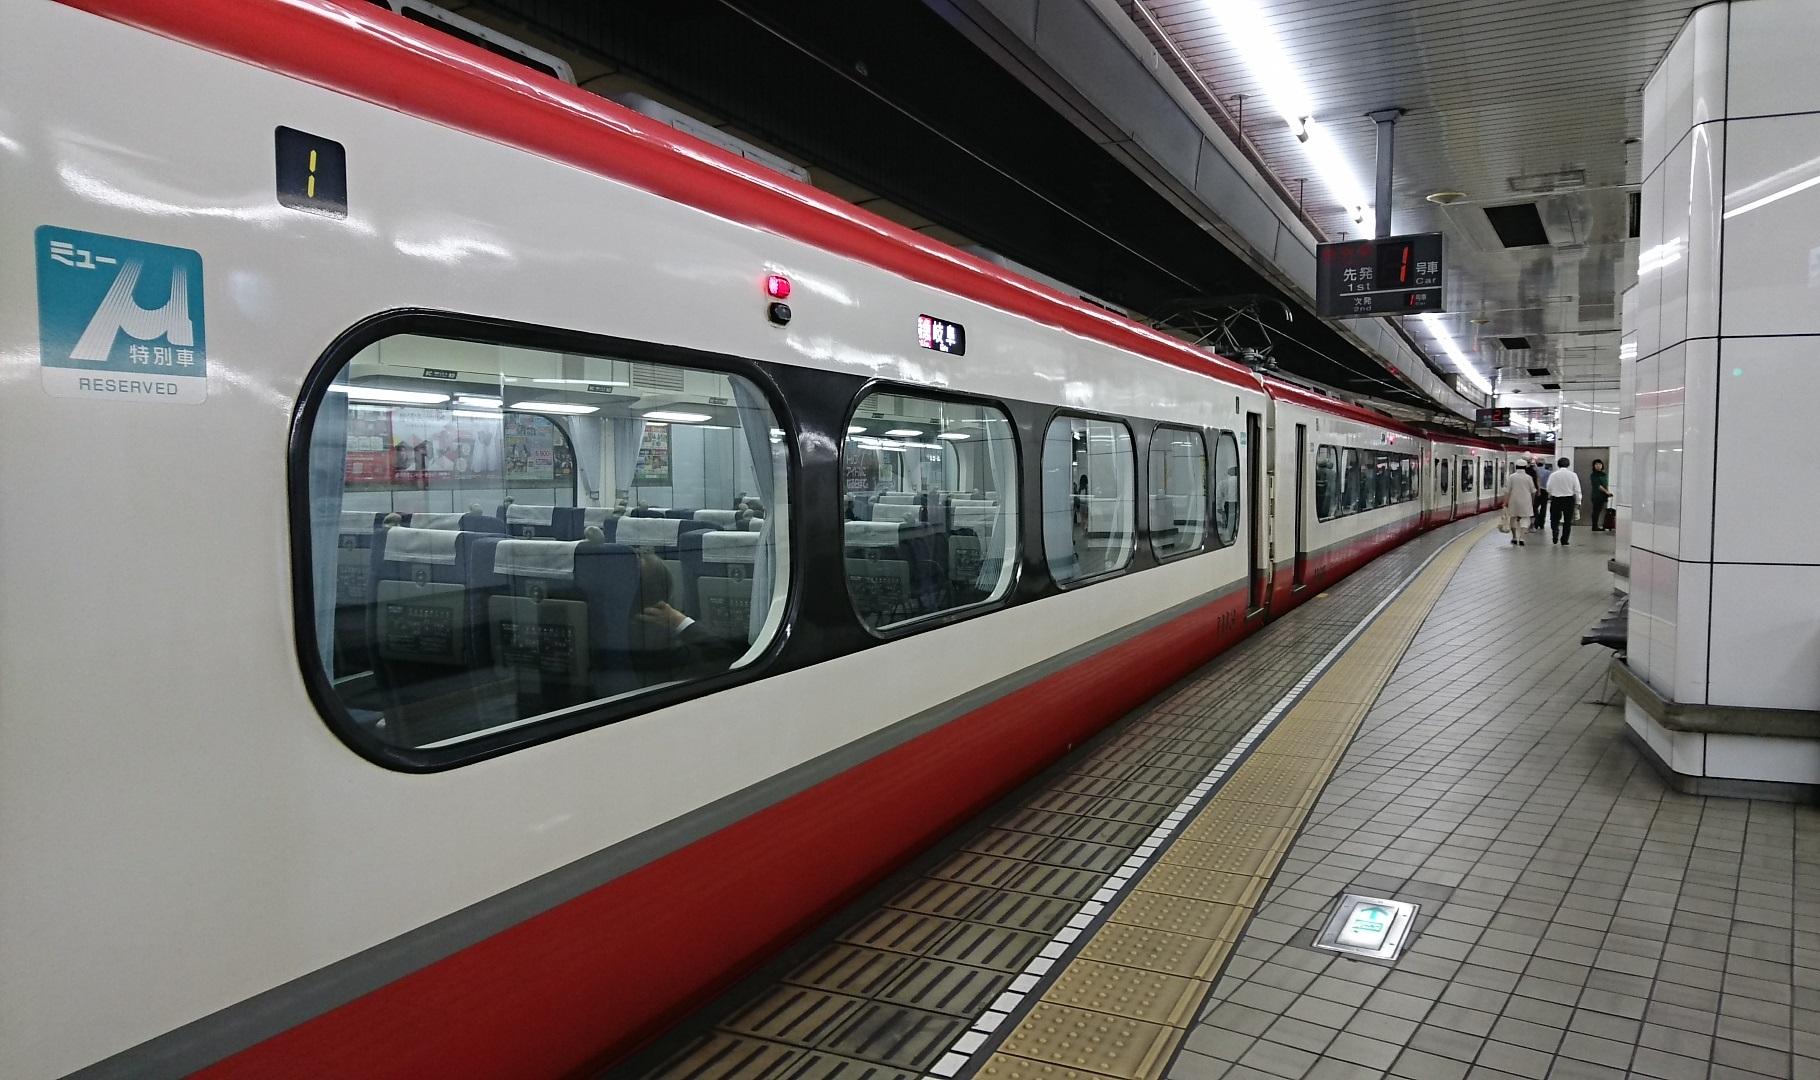 2017.5.14 名古屋 (8) 岐阜いき特急特別車 1820-1080